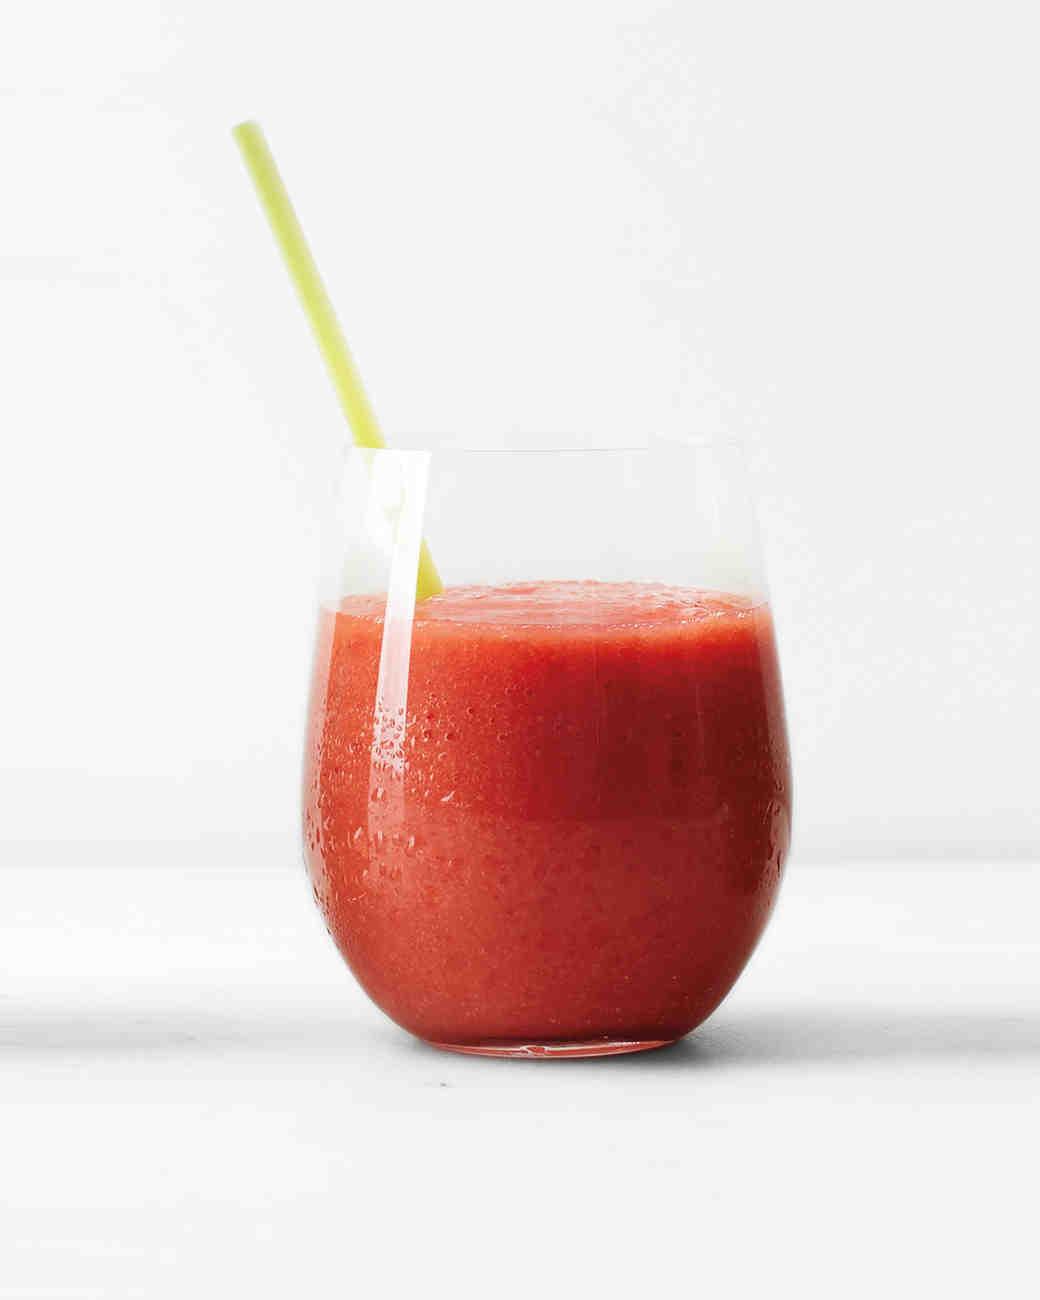 clean-slate-juice-strawberry-grapefruit-ginger-smoothie-0115.jpg